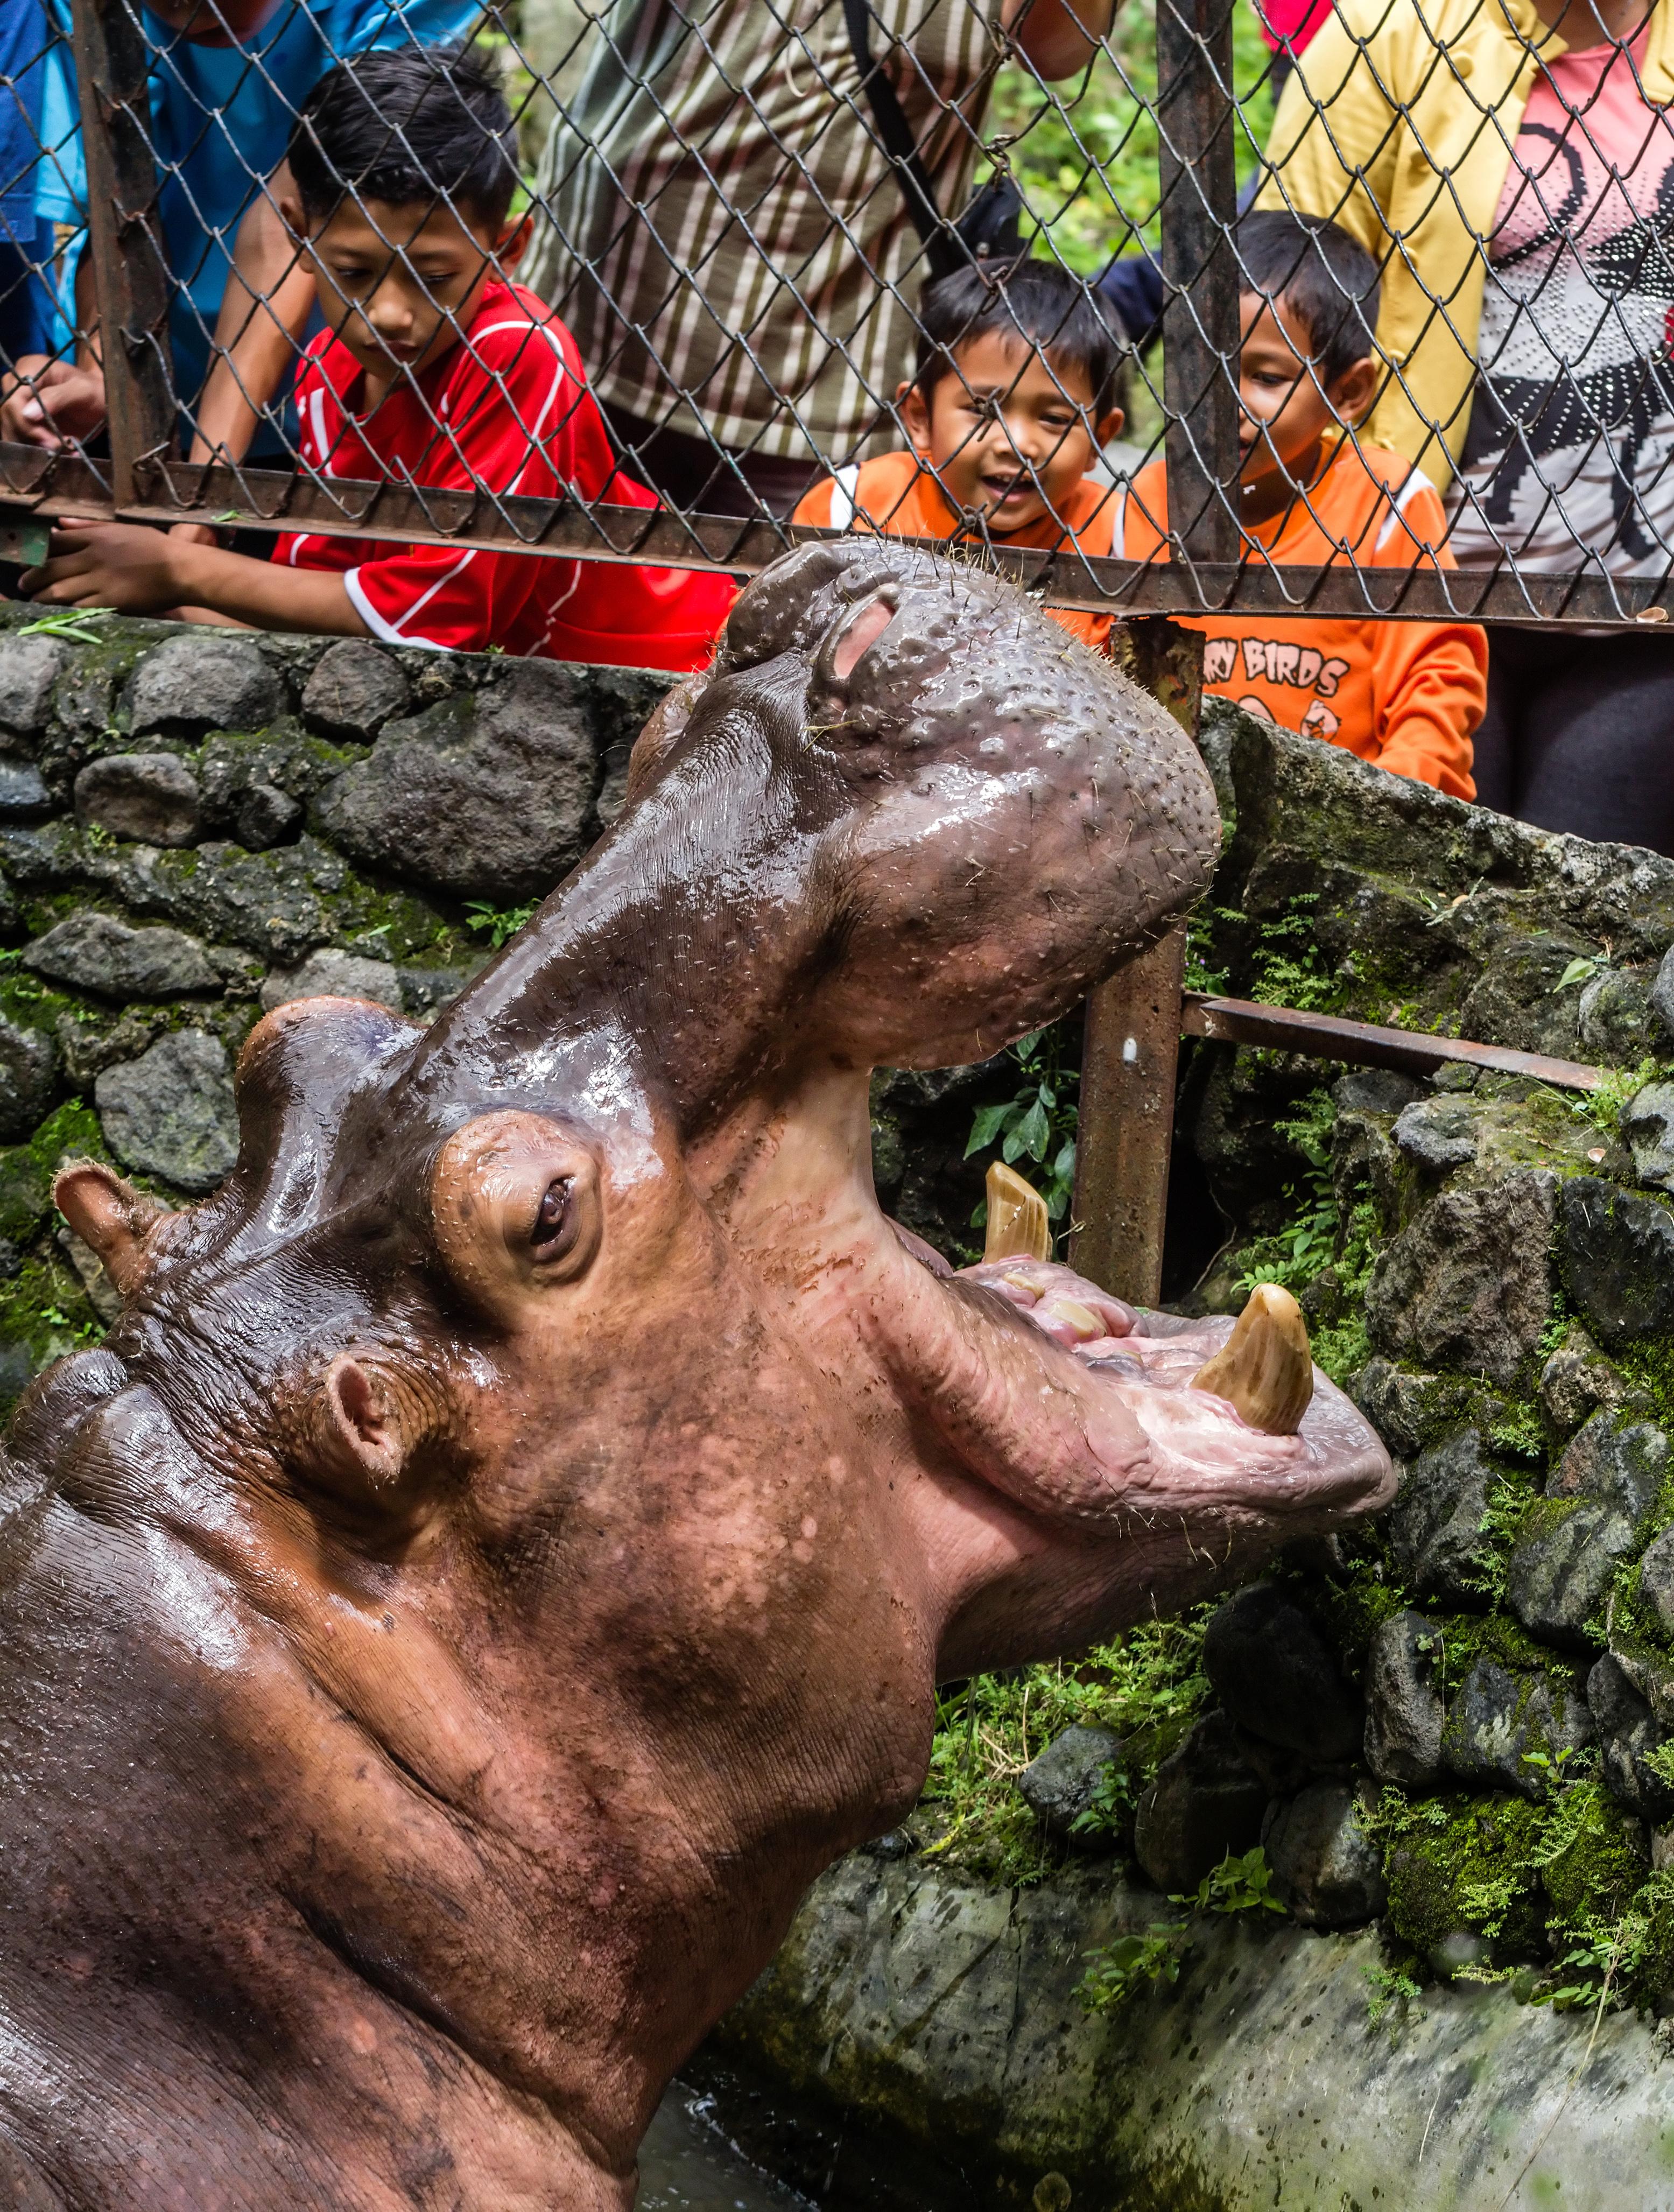 File African Hippopotamus Greeting Guests Gembira Loka Zoo Yogyakarta 2015